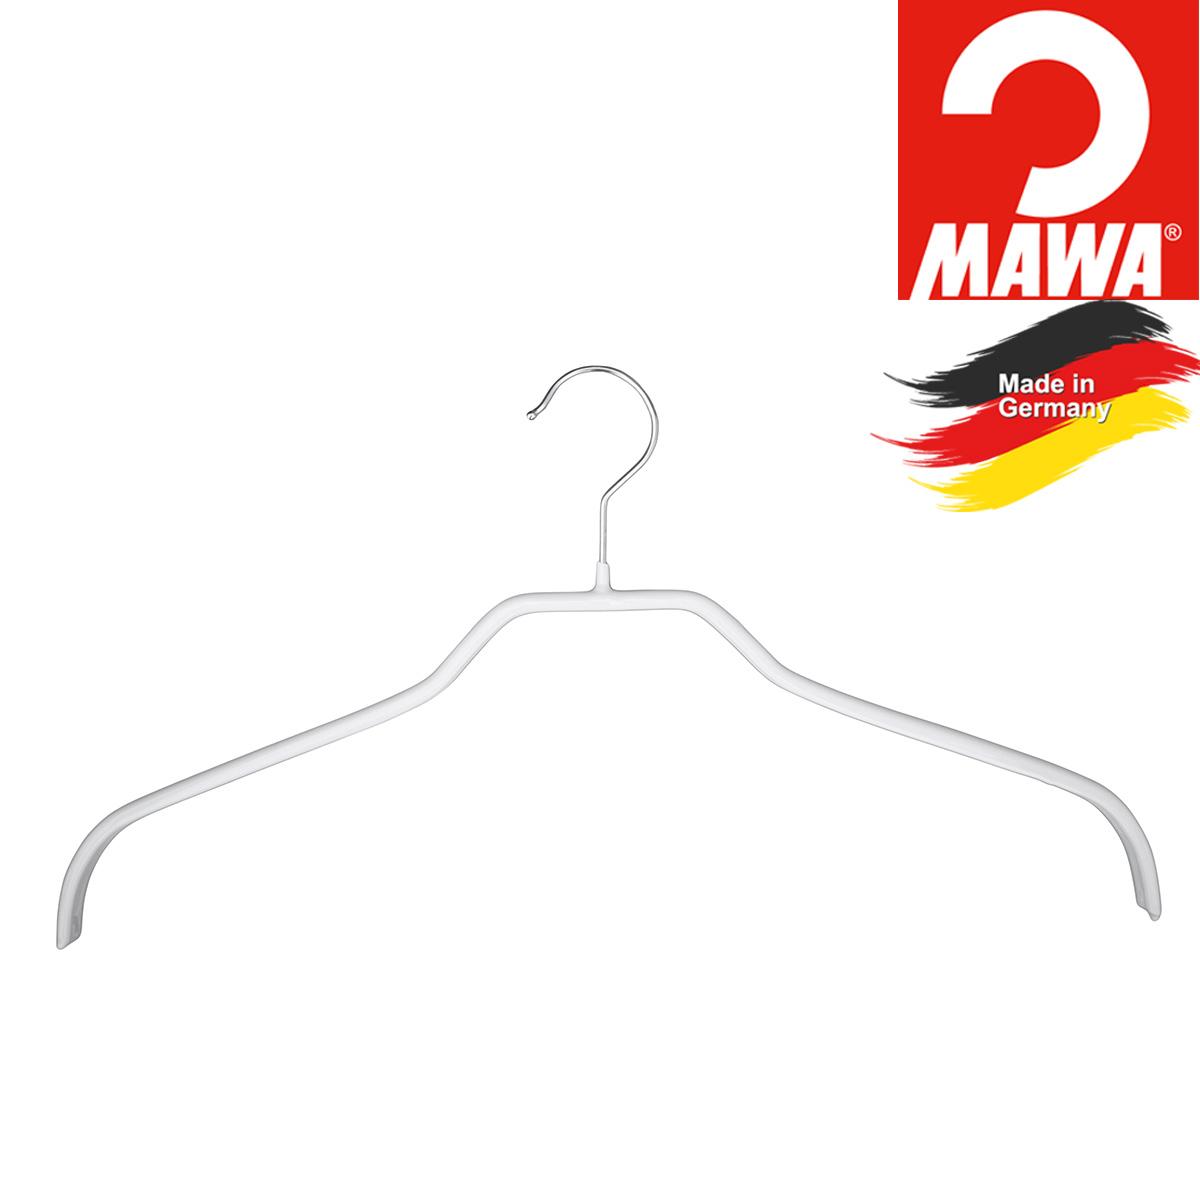 MAWA Blusen Kleiderbügel